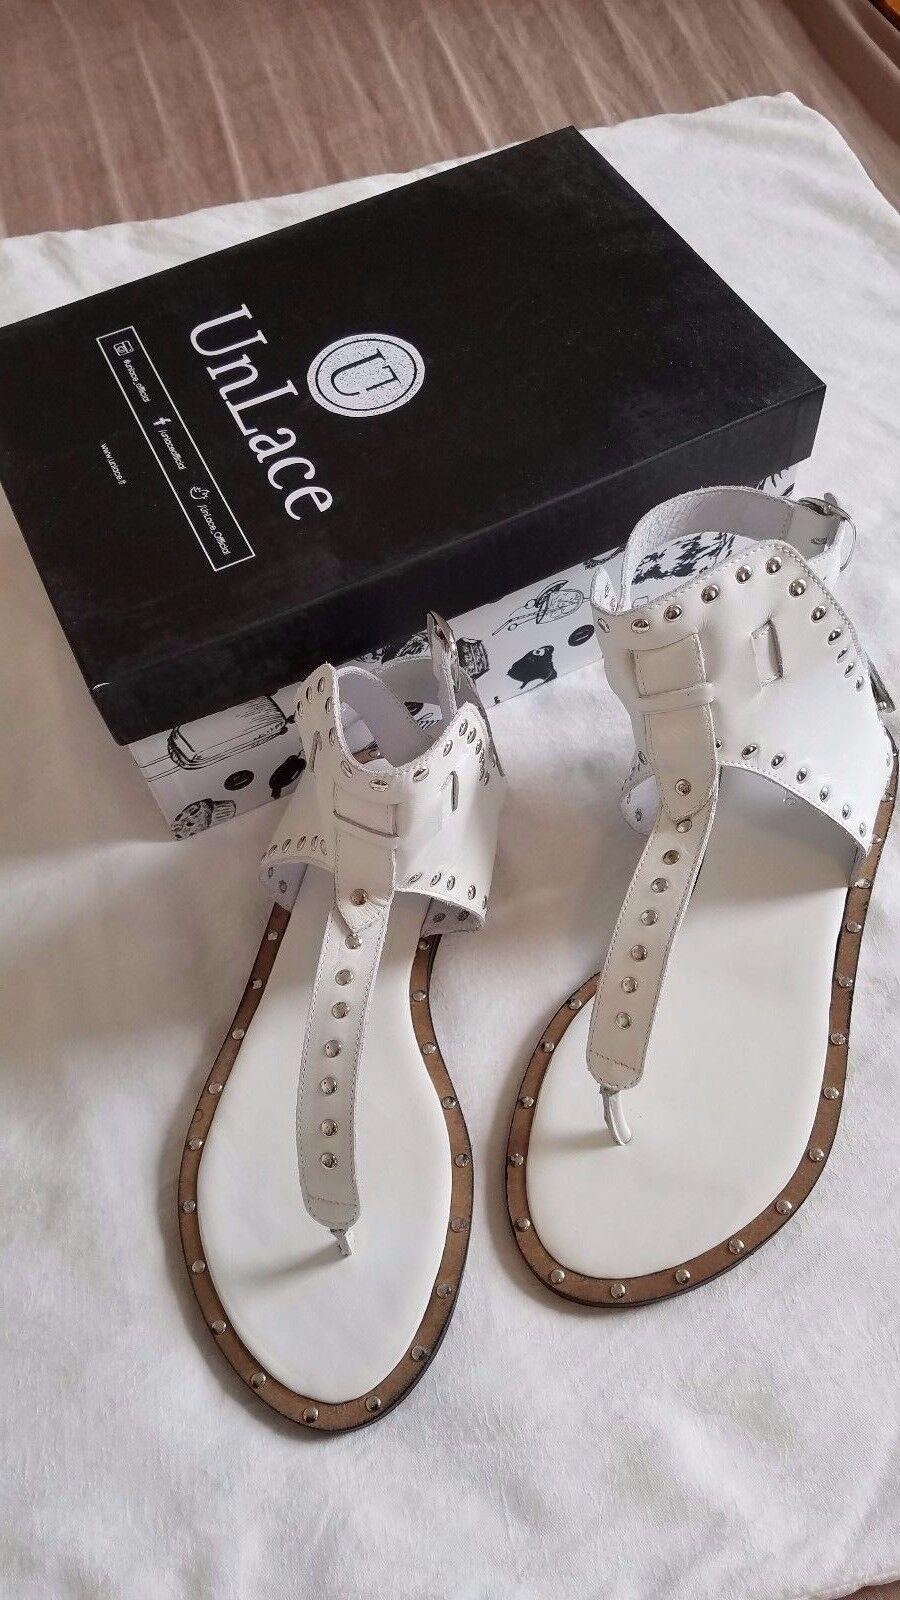 Damenschuhe Fashion Schuhes UnLace Federica SS16 WEISS Größe 8.5 (eur 39)